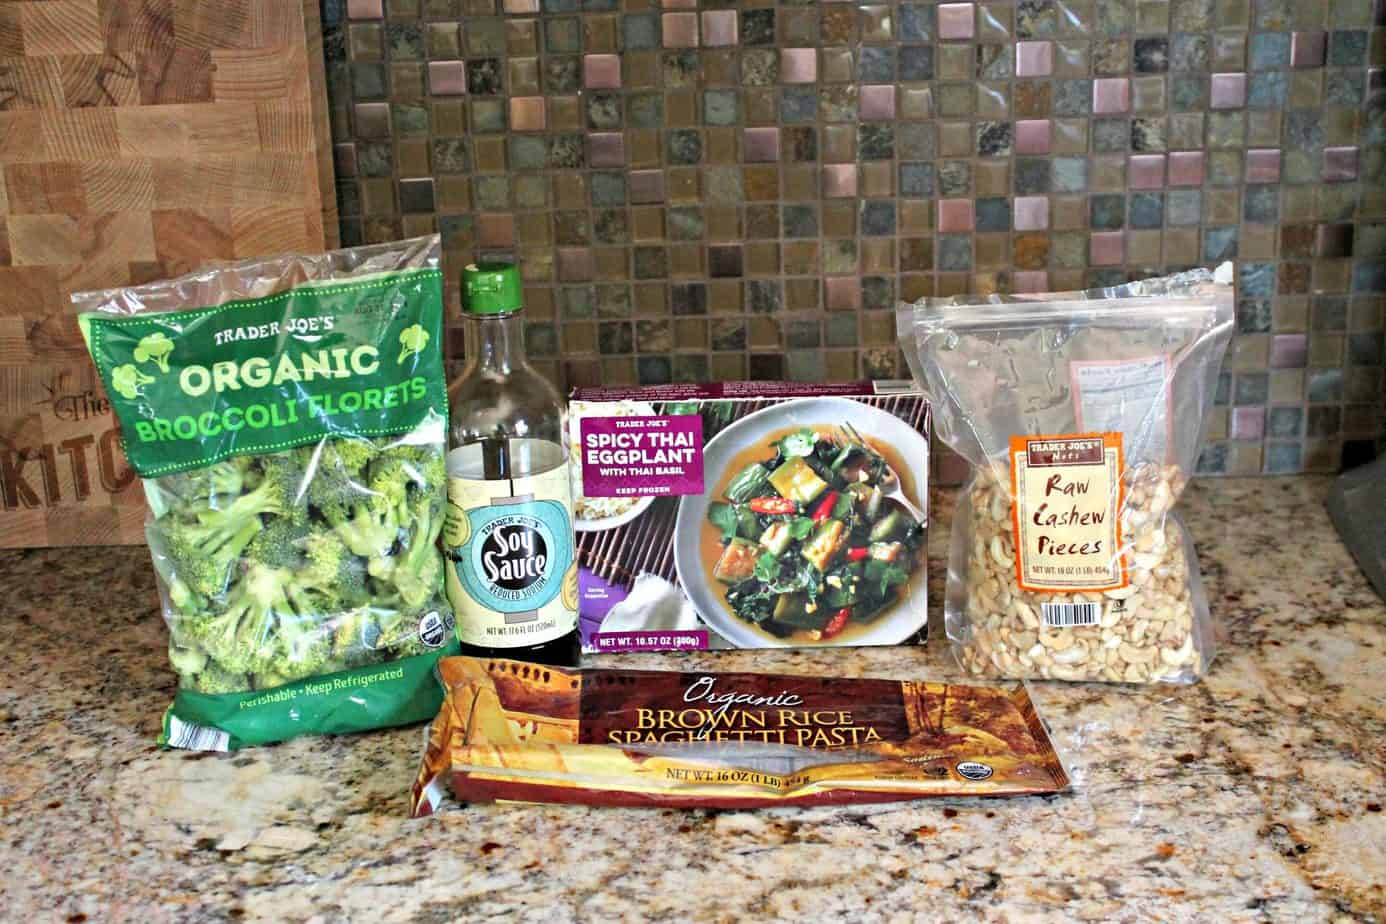 Ingredients for Spicy Thai Eggplant Stir Fry